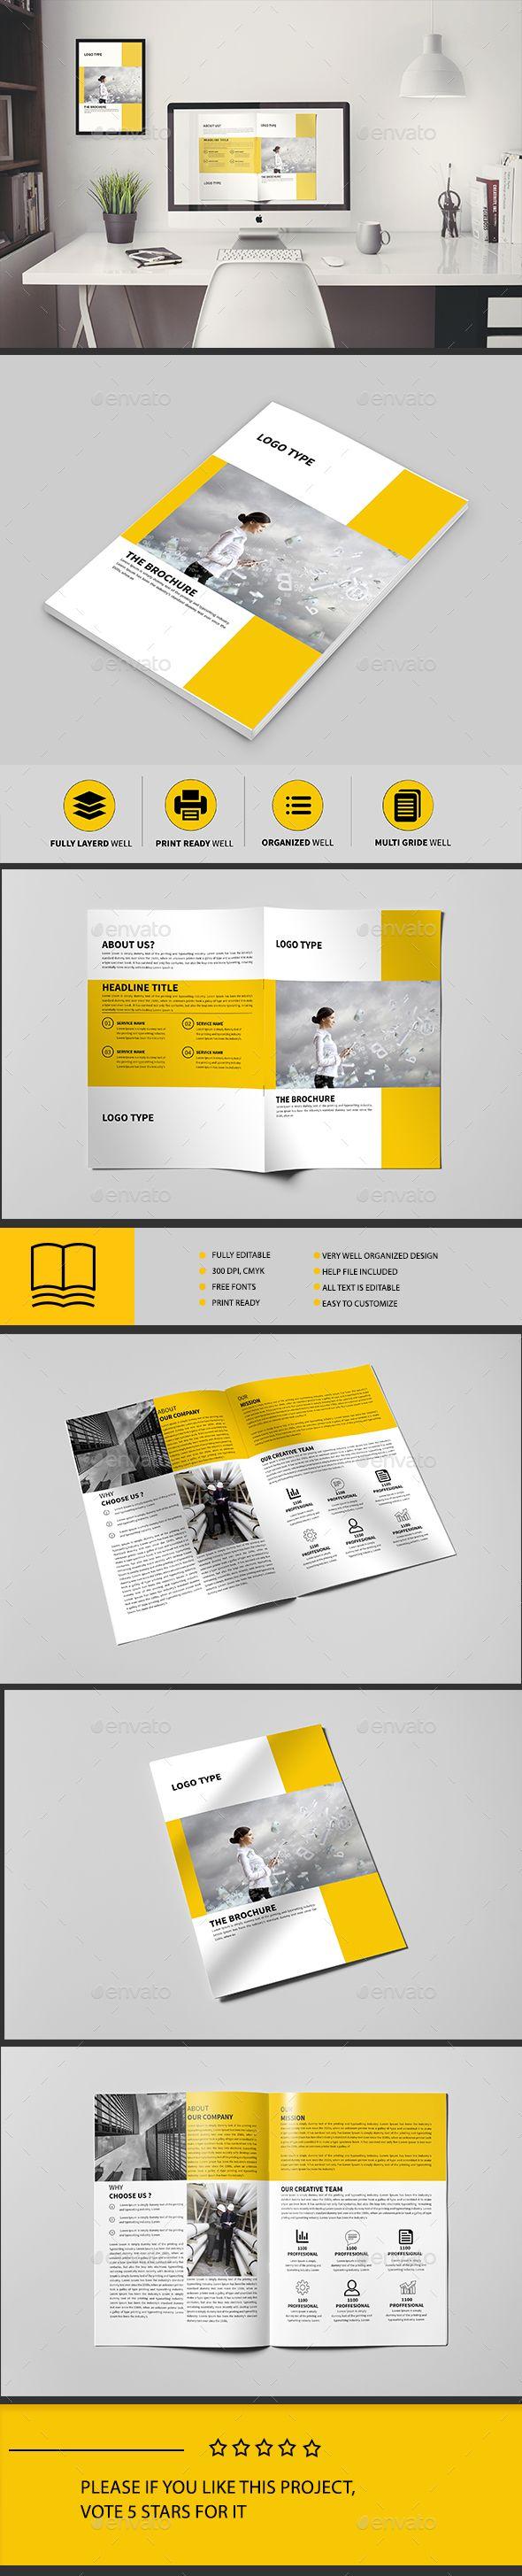 Corporate Bi-Fold Brochure Template InDesign INDD. Download here: https://graphicriver.net/item/corporate-bifold-brochure-04/17547863?ref=ksioks